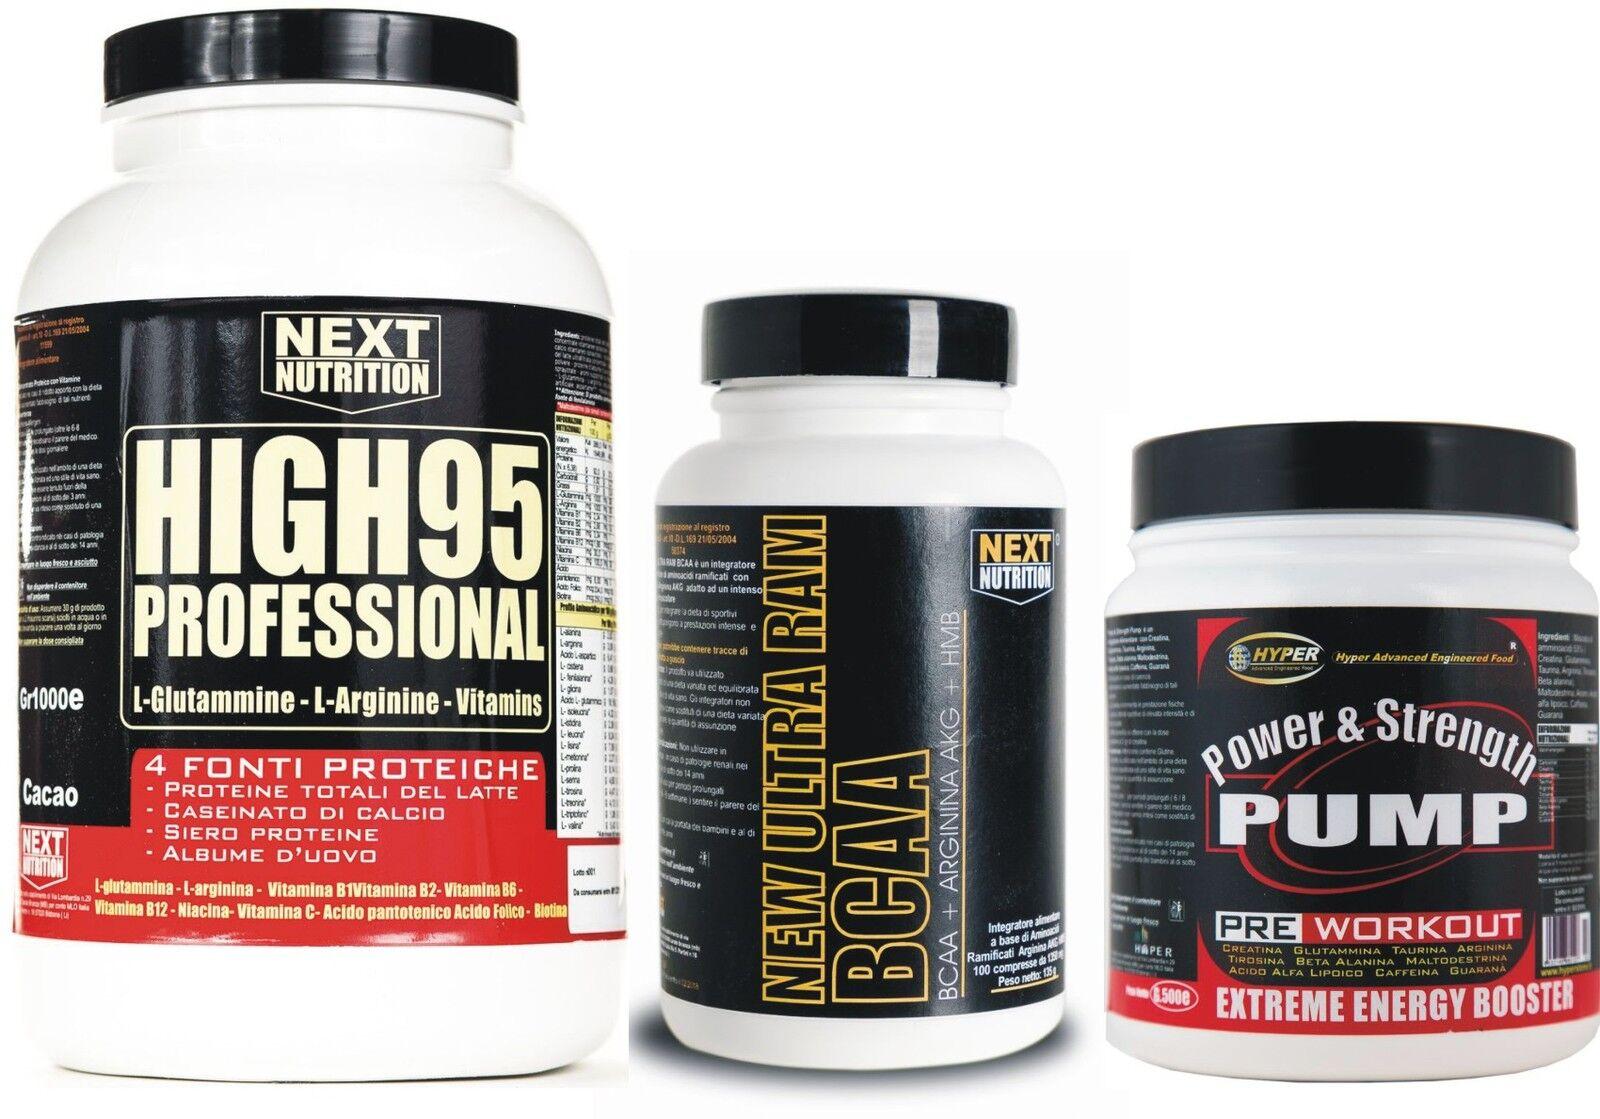 Kit Massa Proteine 90% Kg1 Vaniglia  Aminoacidi BCAA 100cp Pre Workout gr500